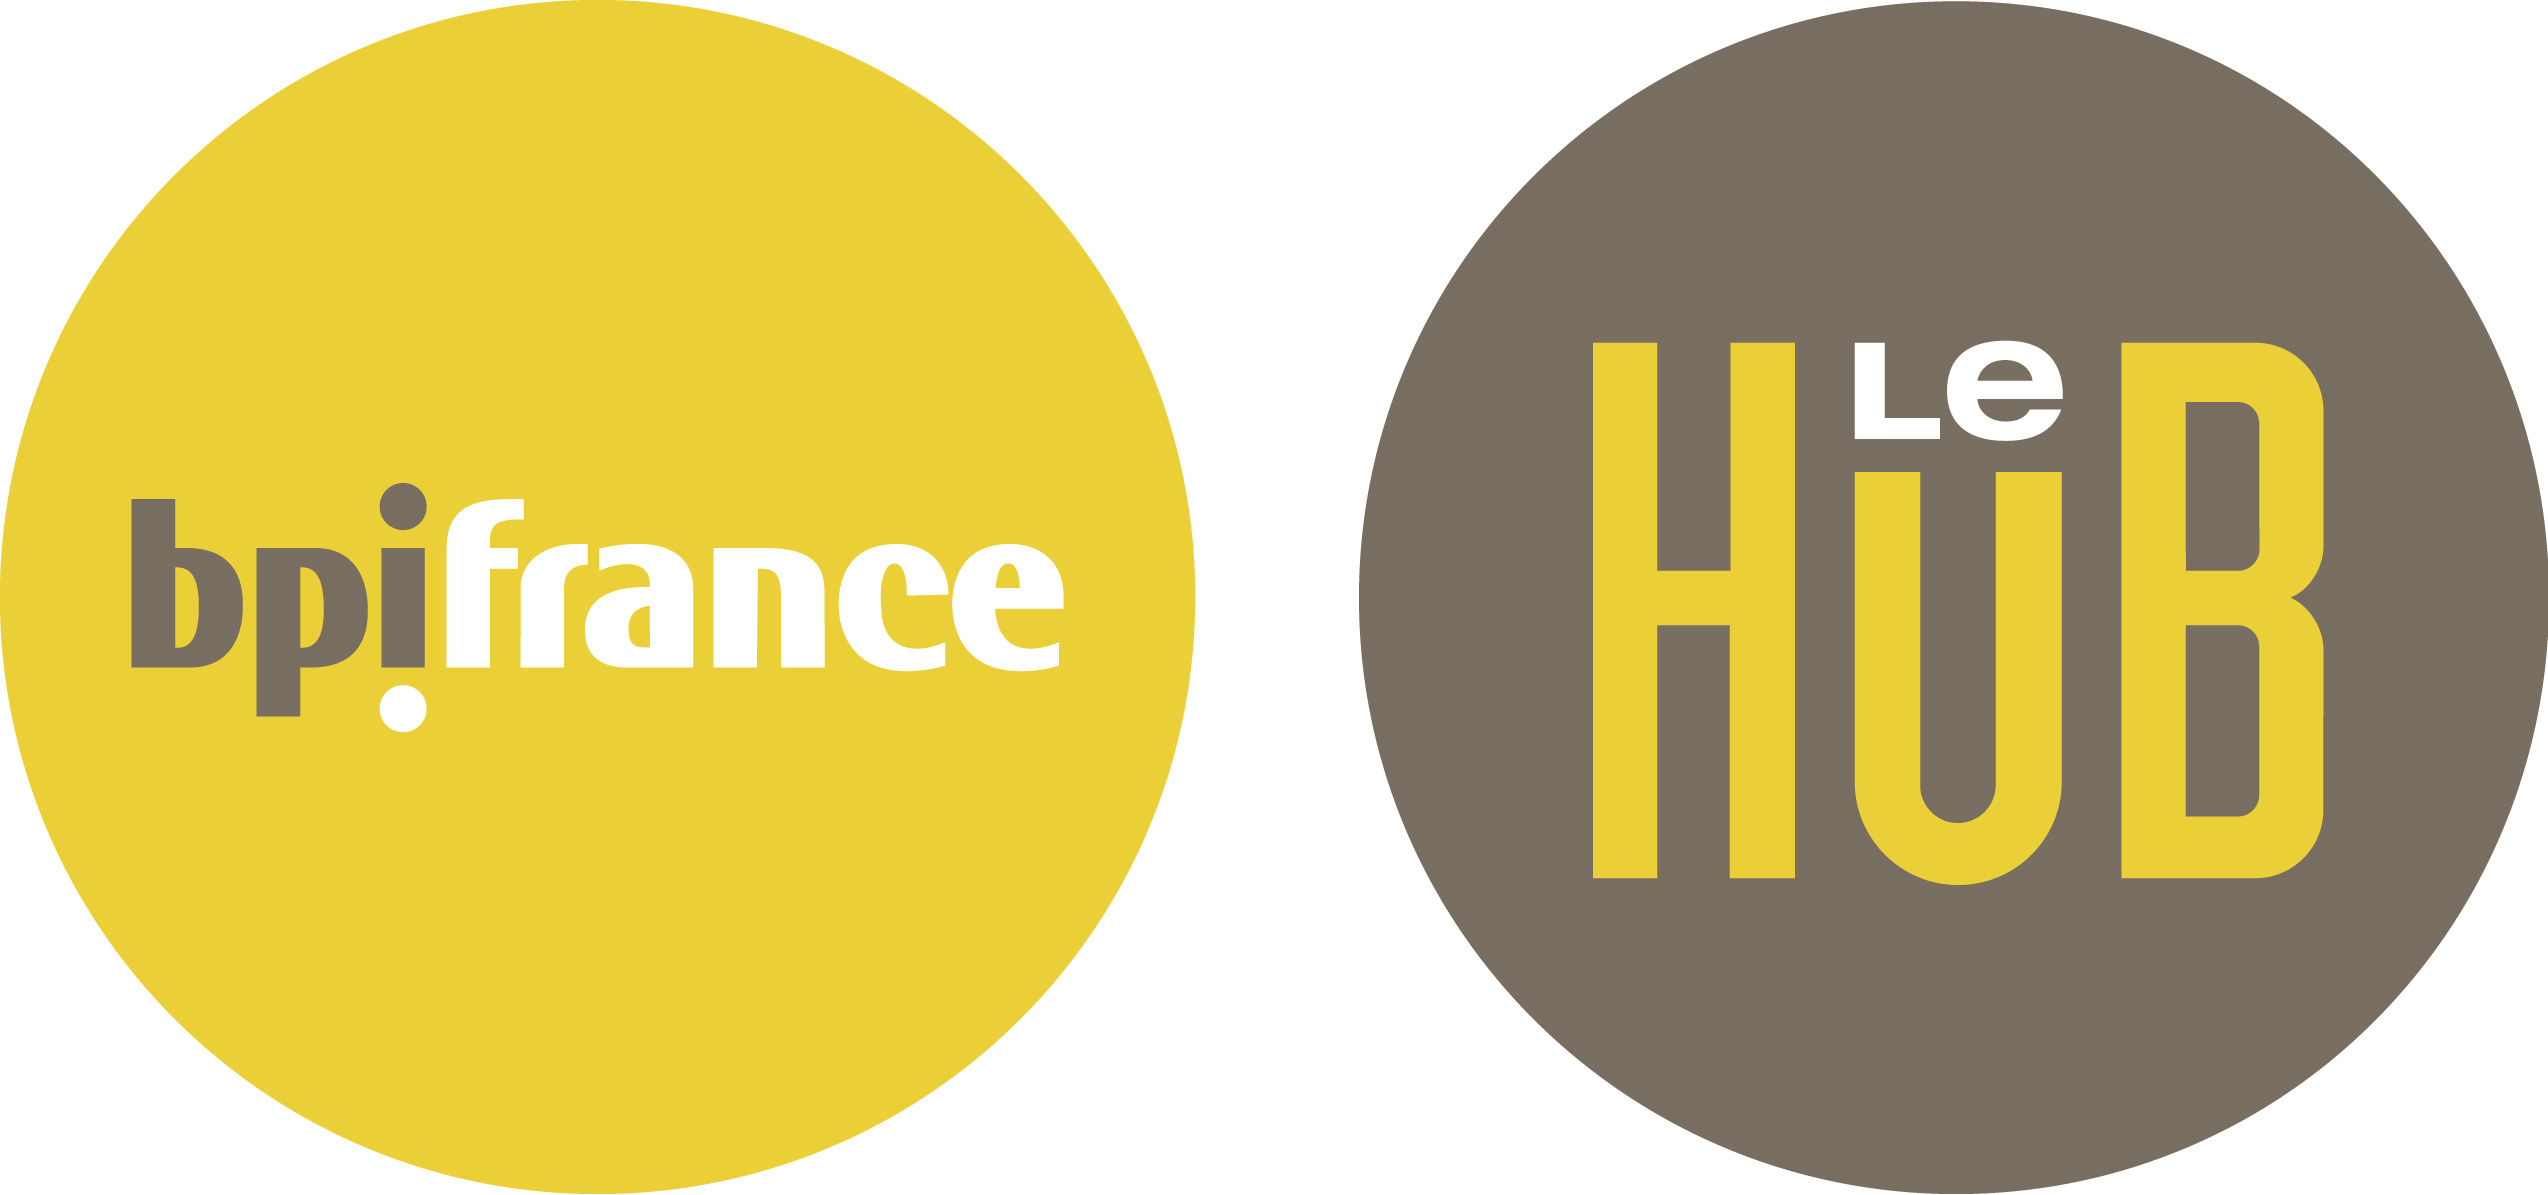 Hub Startup : Bpifrance lance les startups à l'assaut du monde !